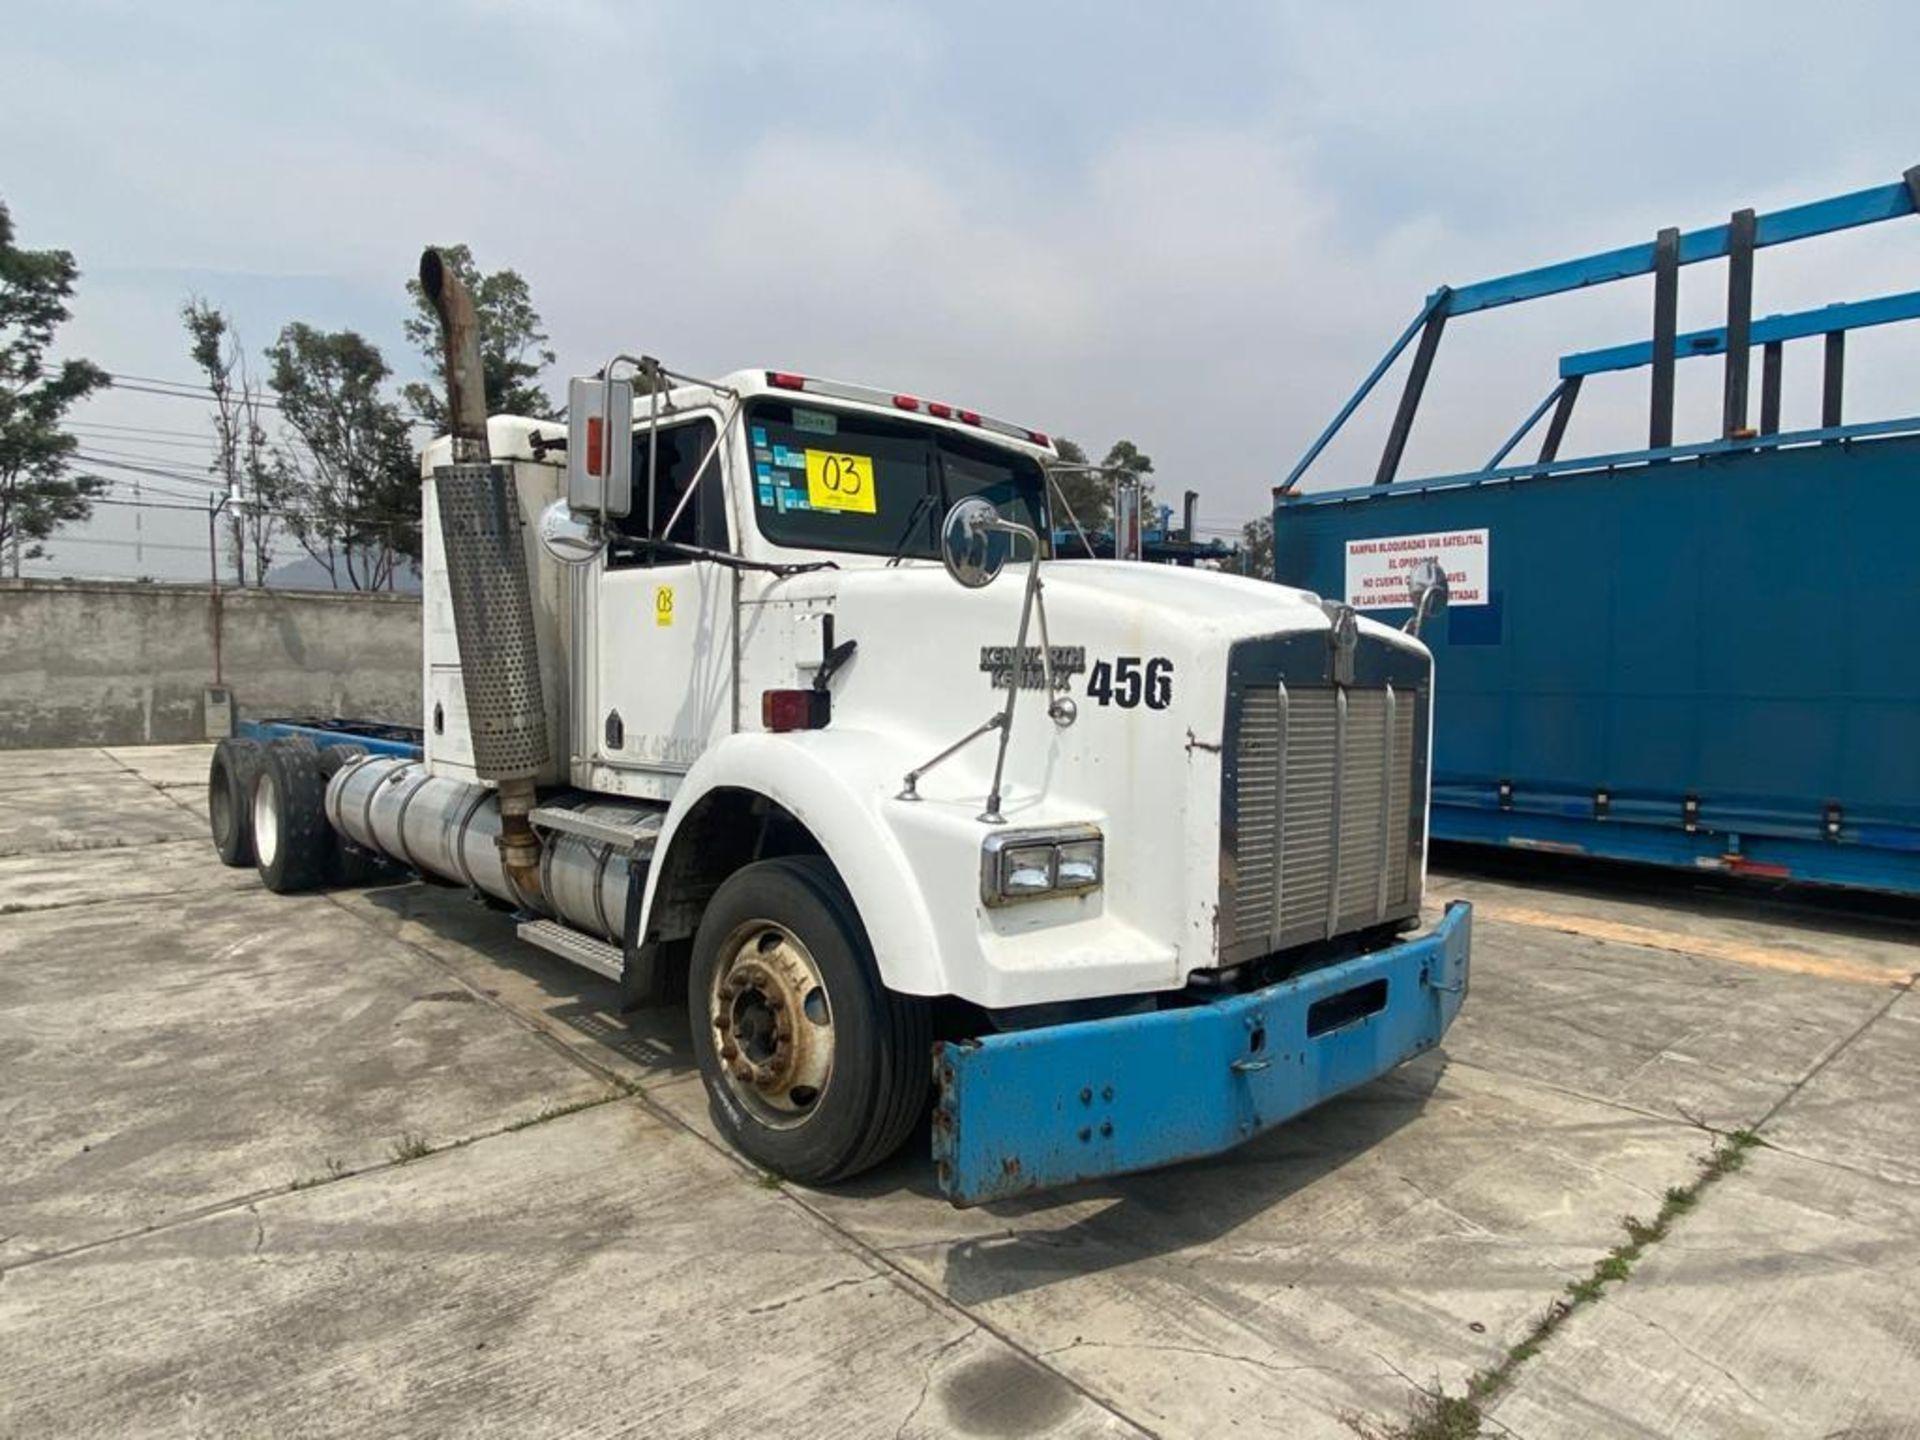 1999 Kenworth Sleeper truck tractor, standard transmission of 18 speeds - Image 2 of 62